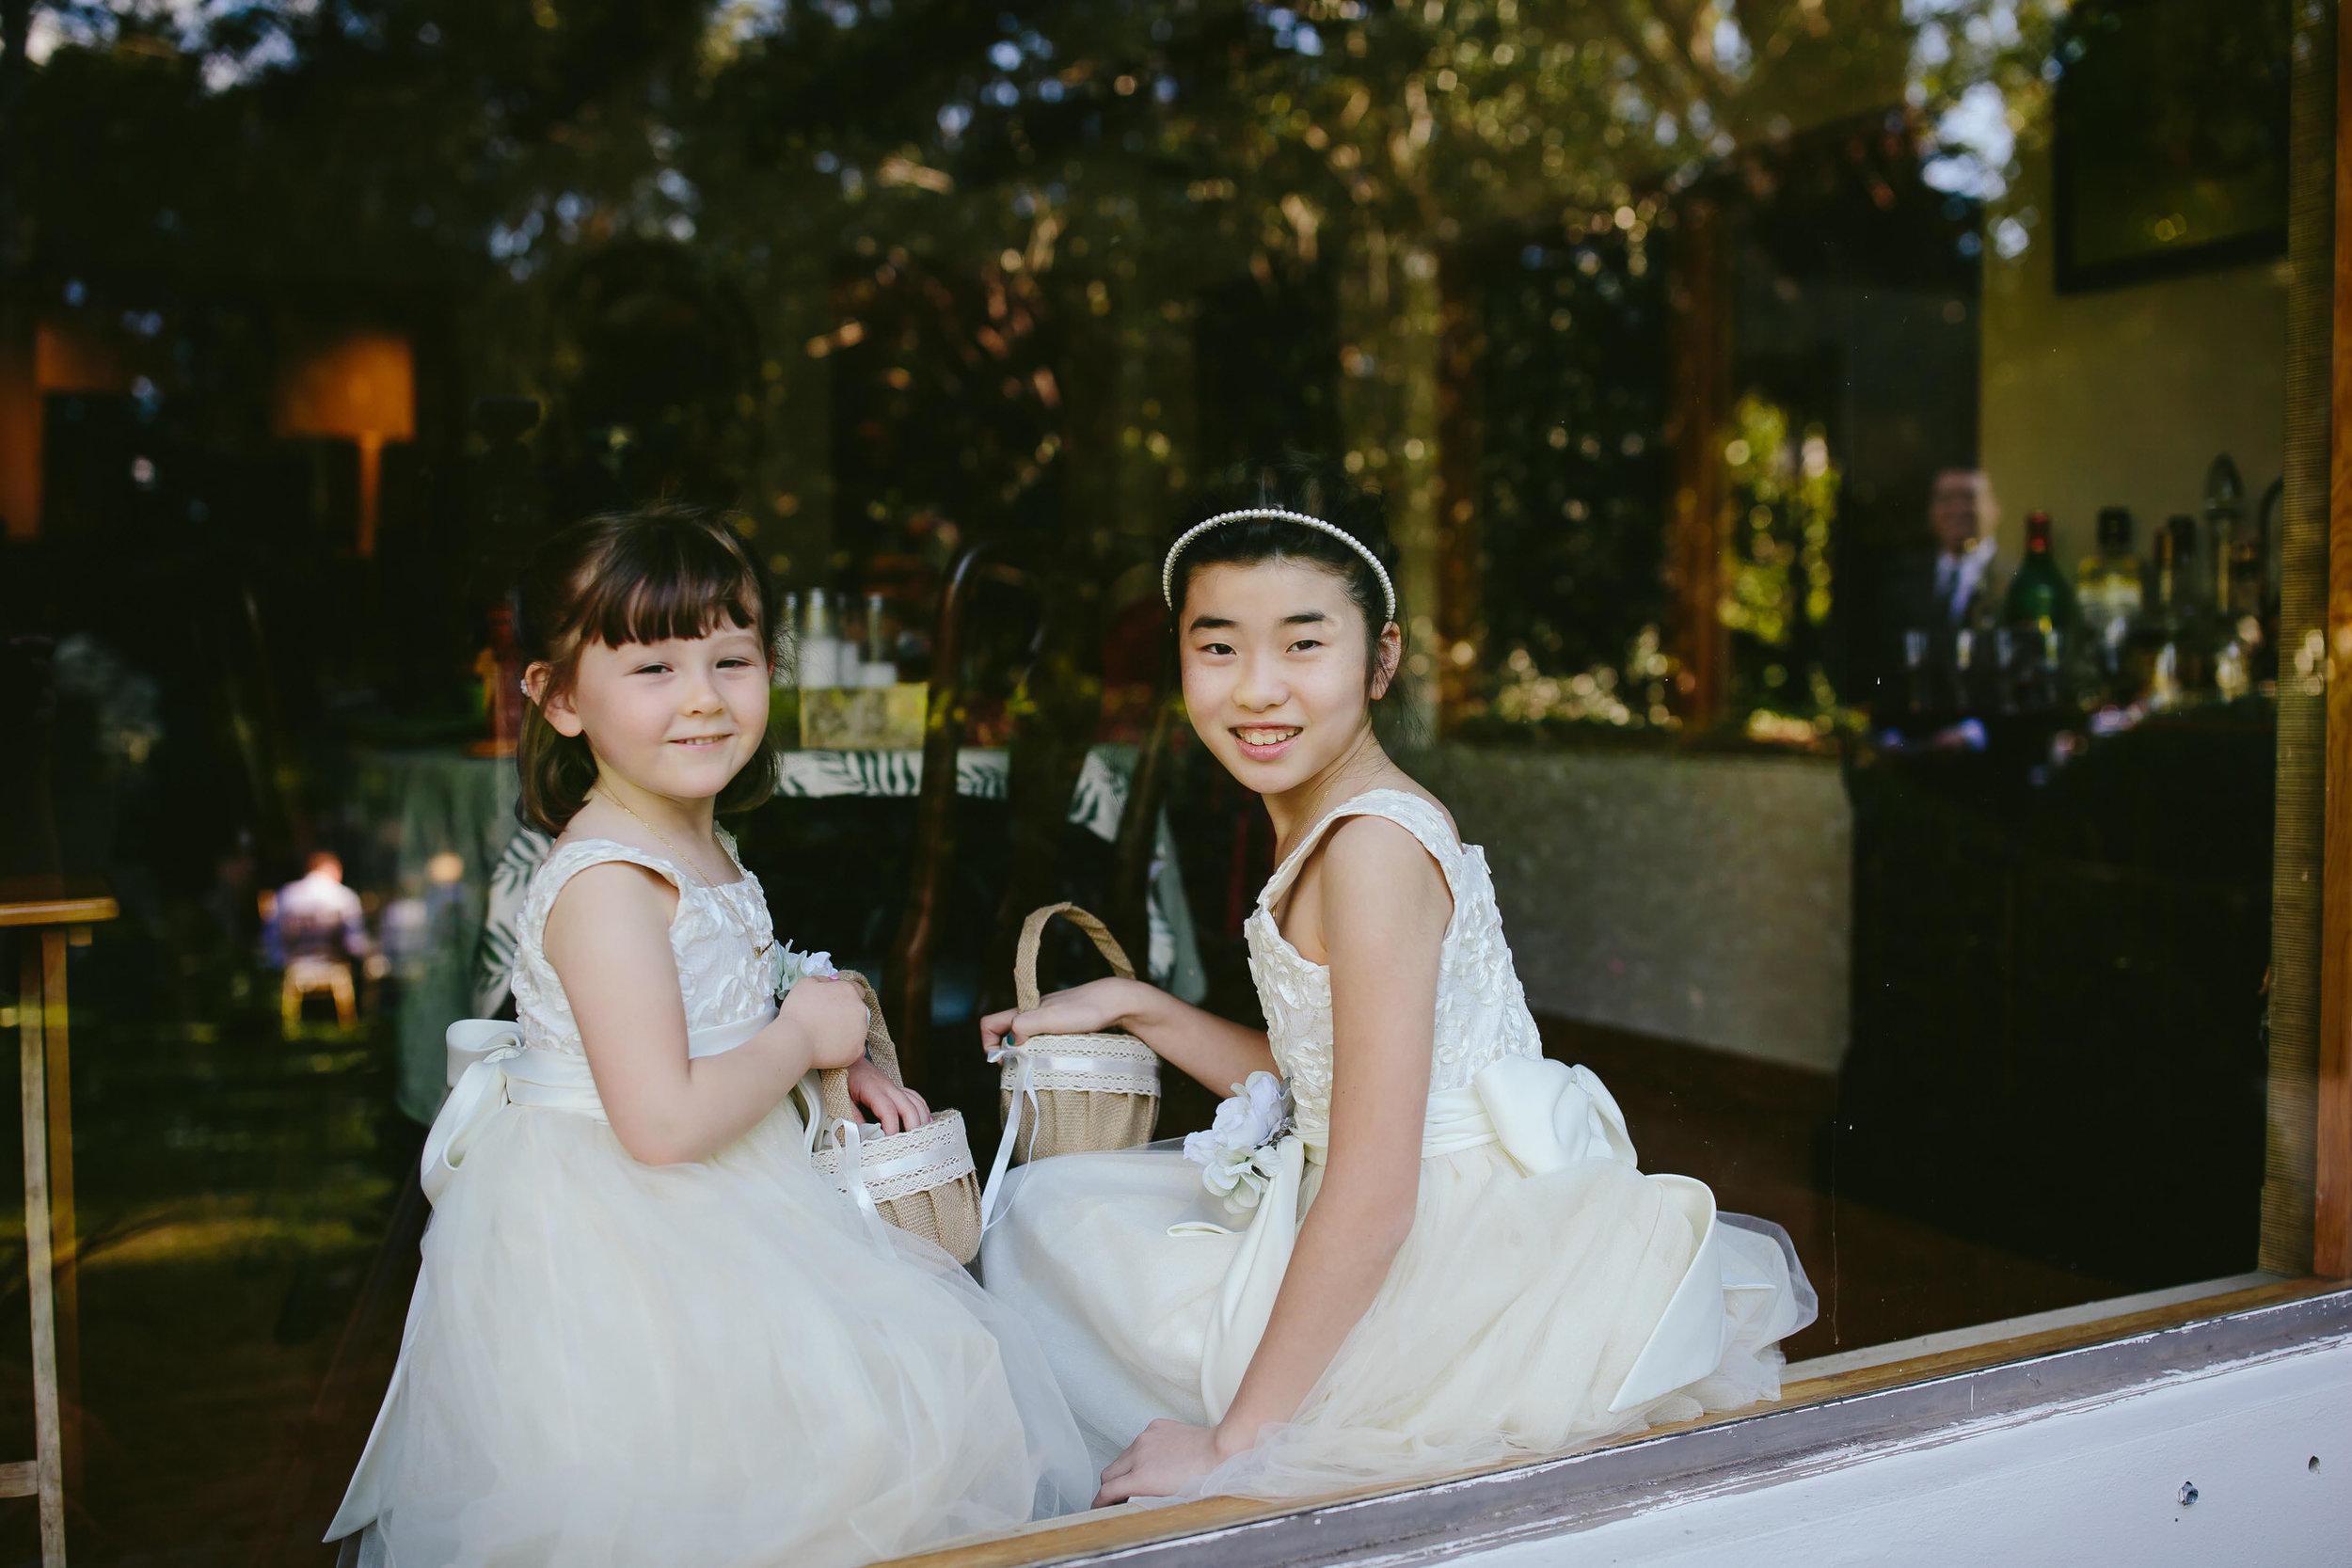 cute_kids_wedding_seattle_wedding_photographer_tiny_house_photo.jpg